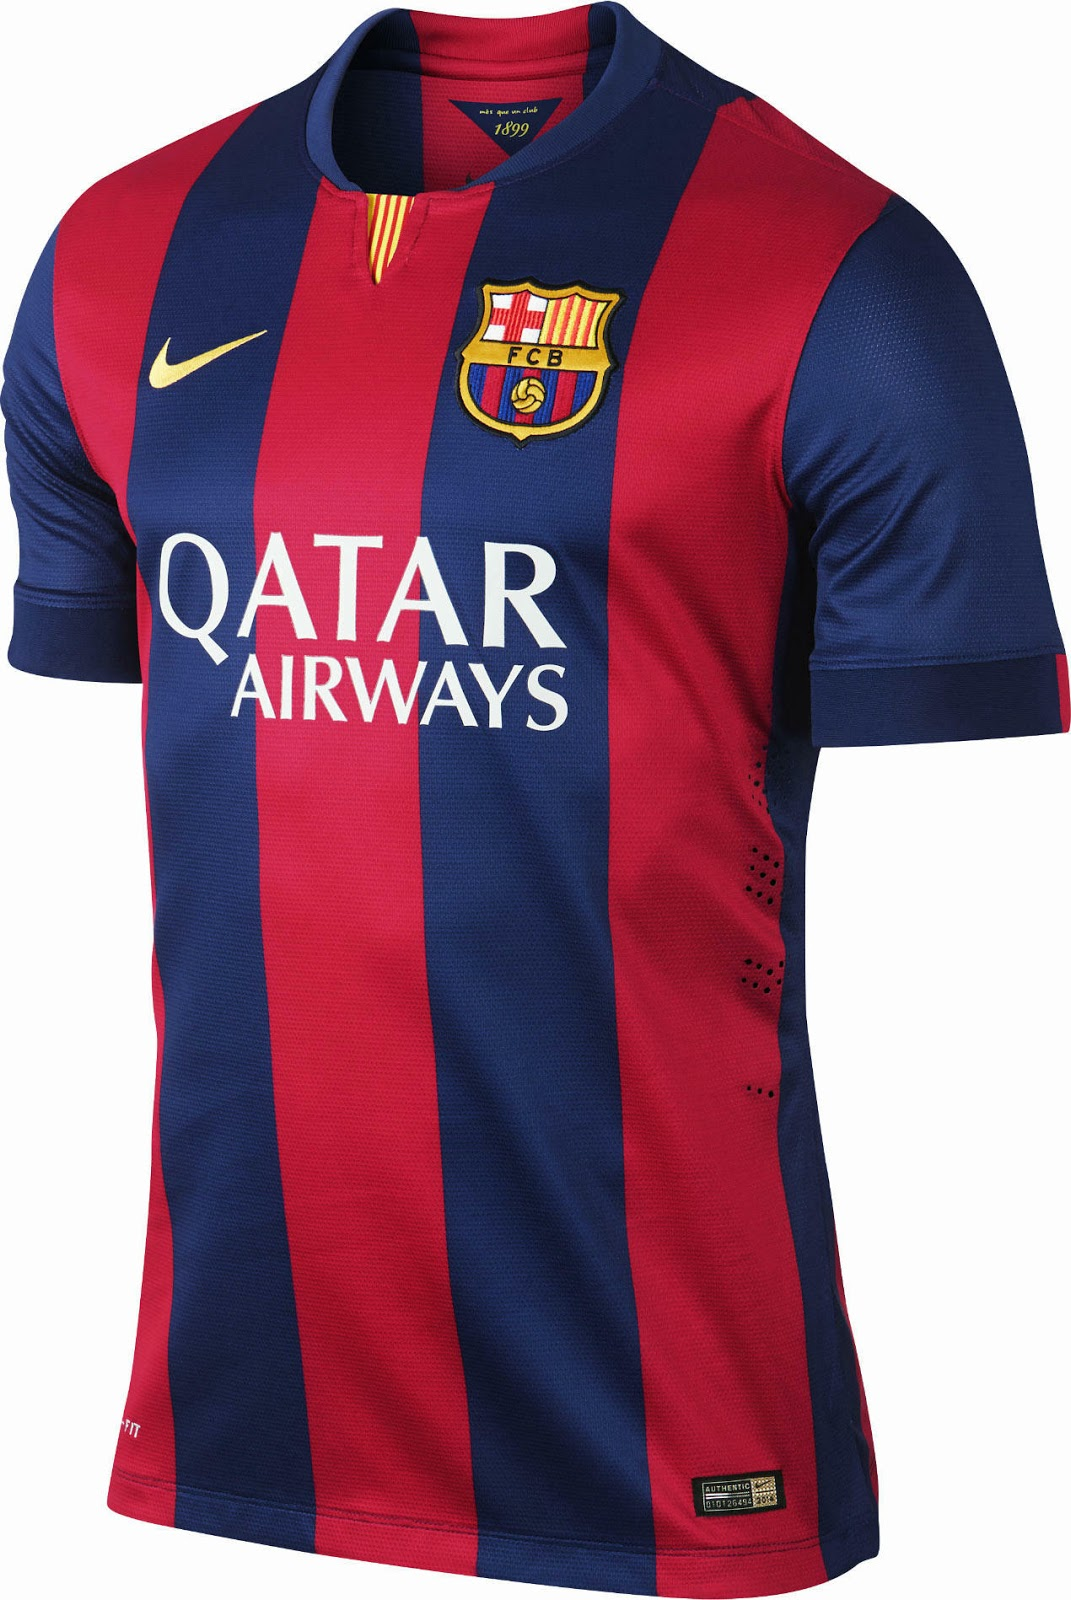 Fc barcelona 14 15 2014 15 home away and third kits - New home barcelona ...